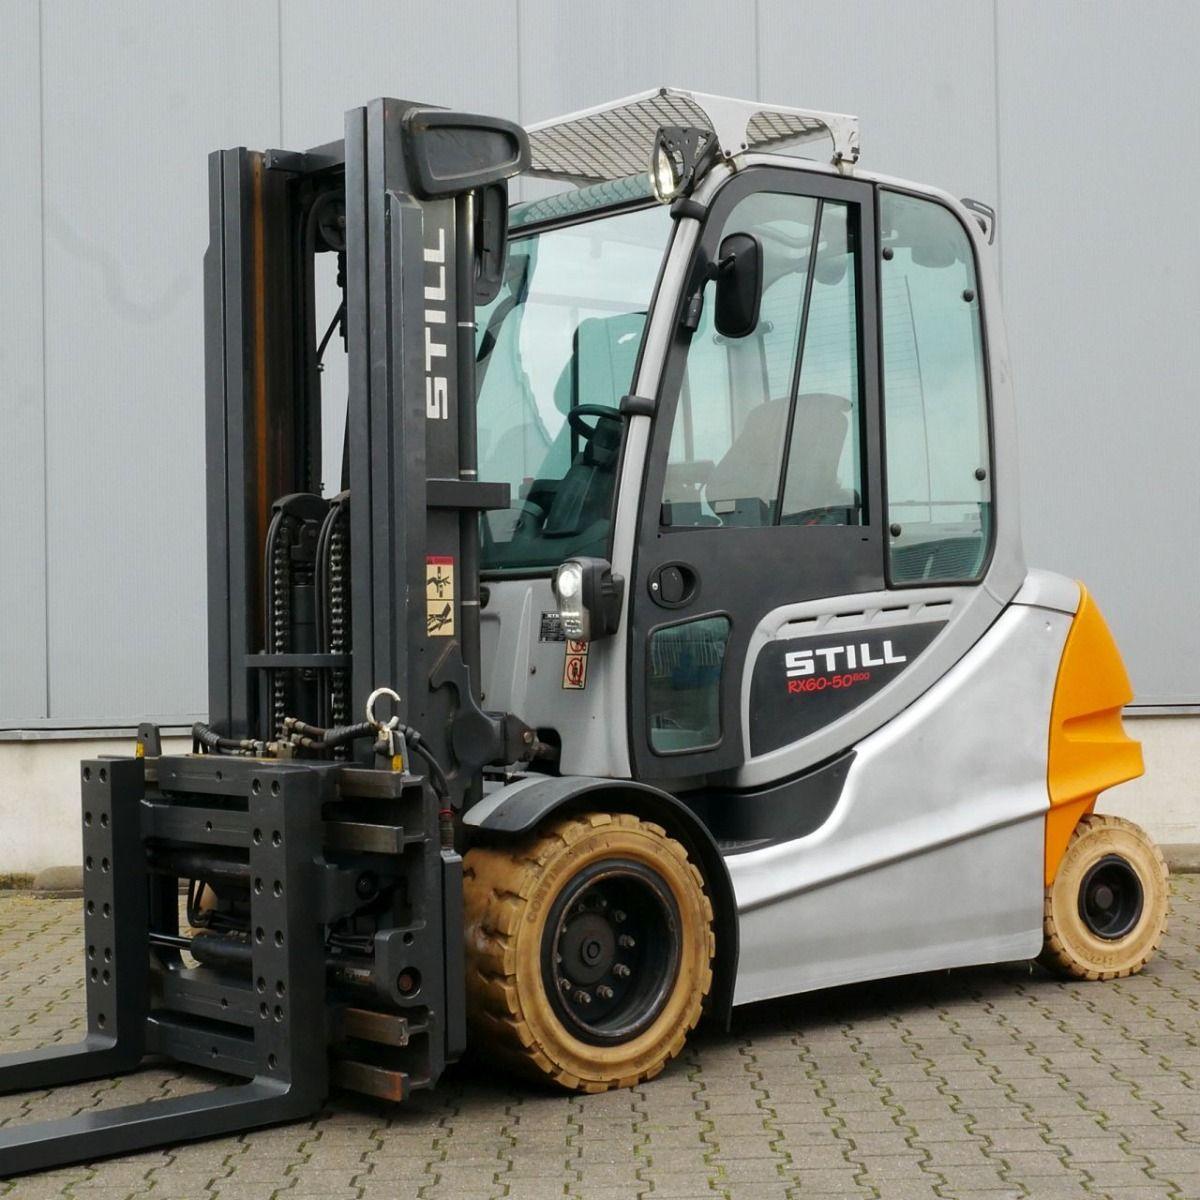 2014-still-rx60-50-600-380121-equipment-cover-image